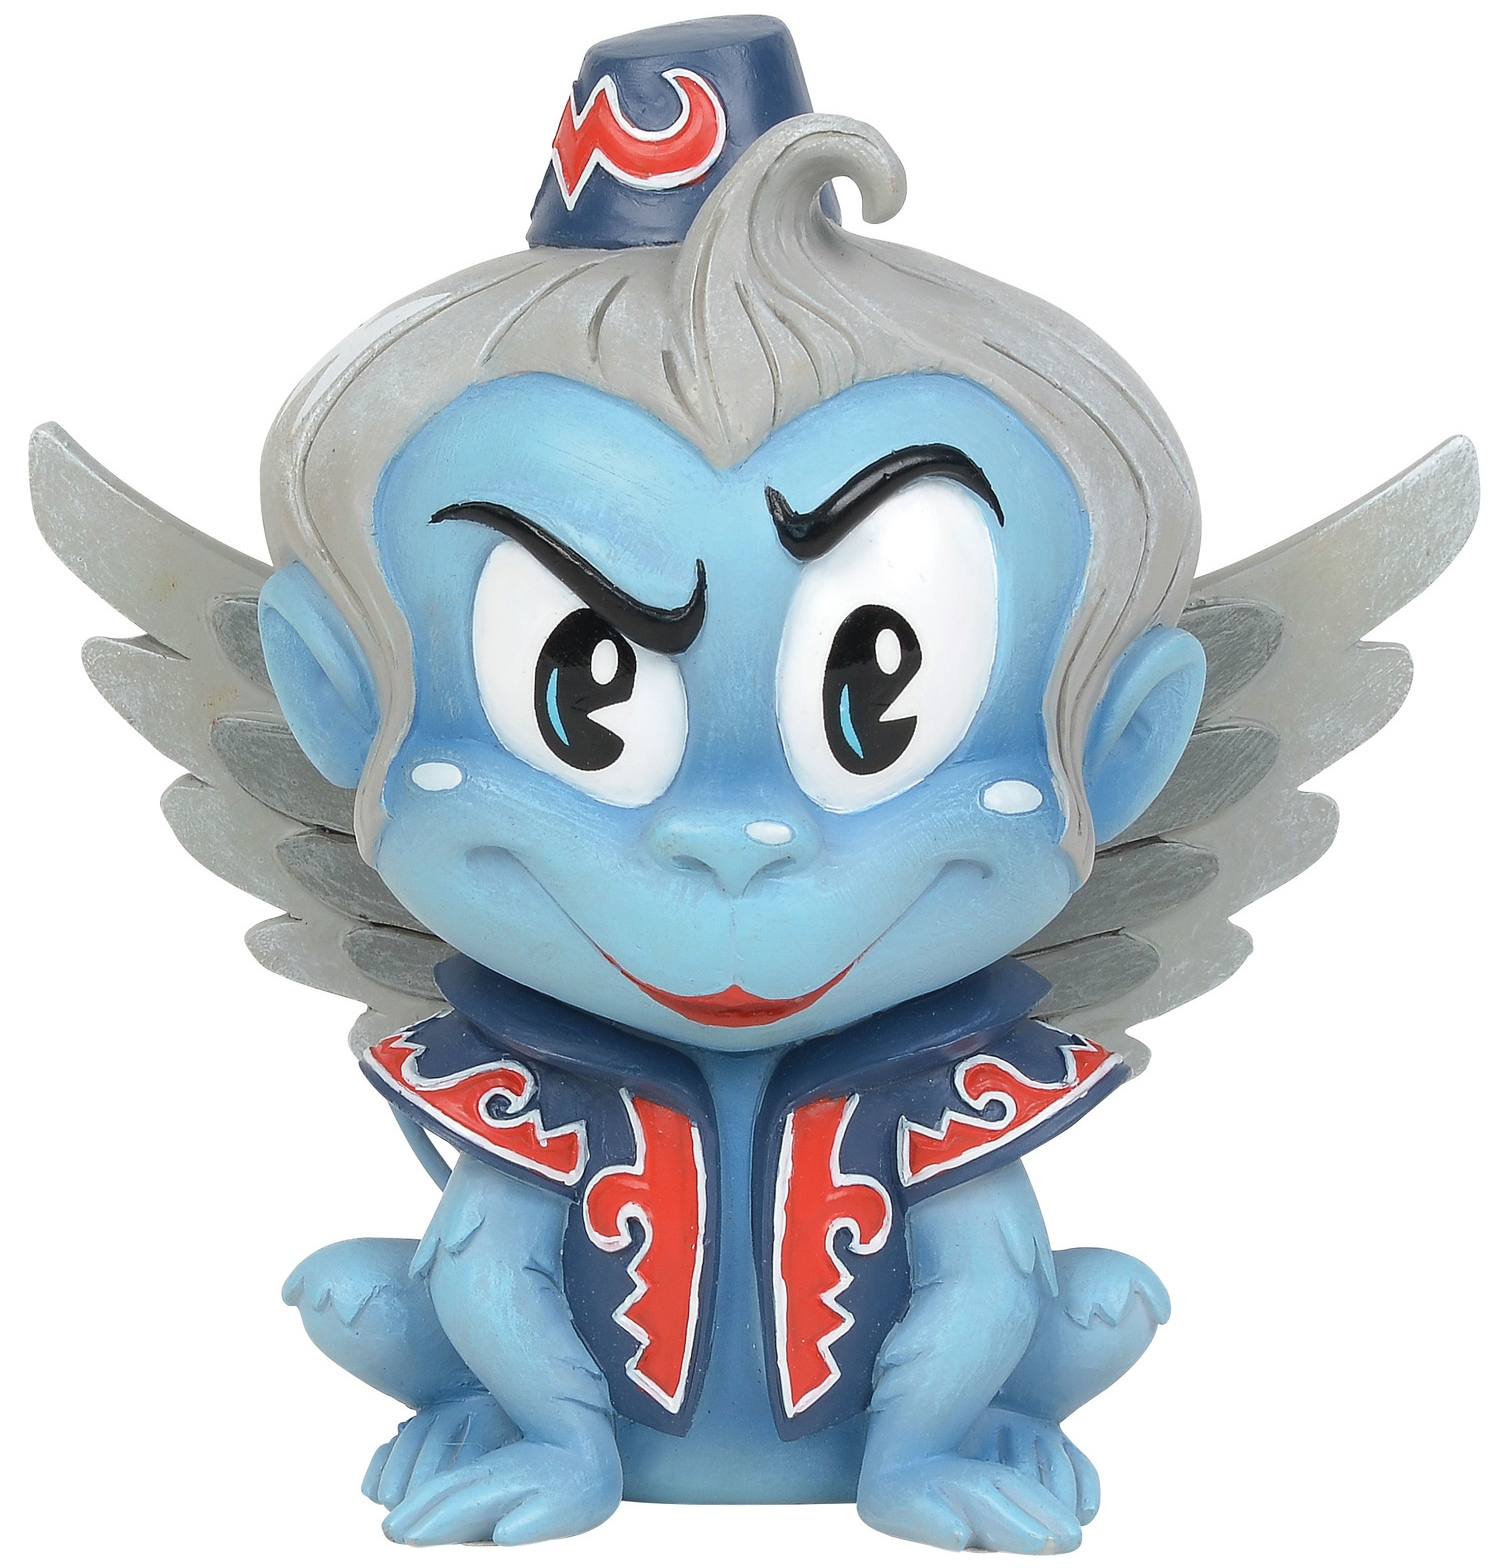 World of Miss Mindy 6004635 Winged Monkey Figurine